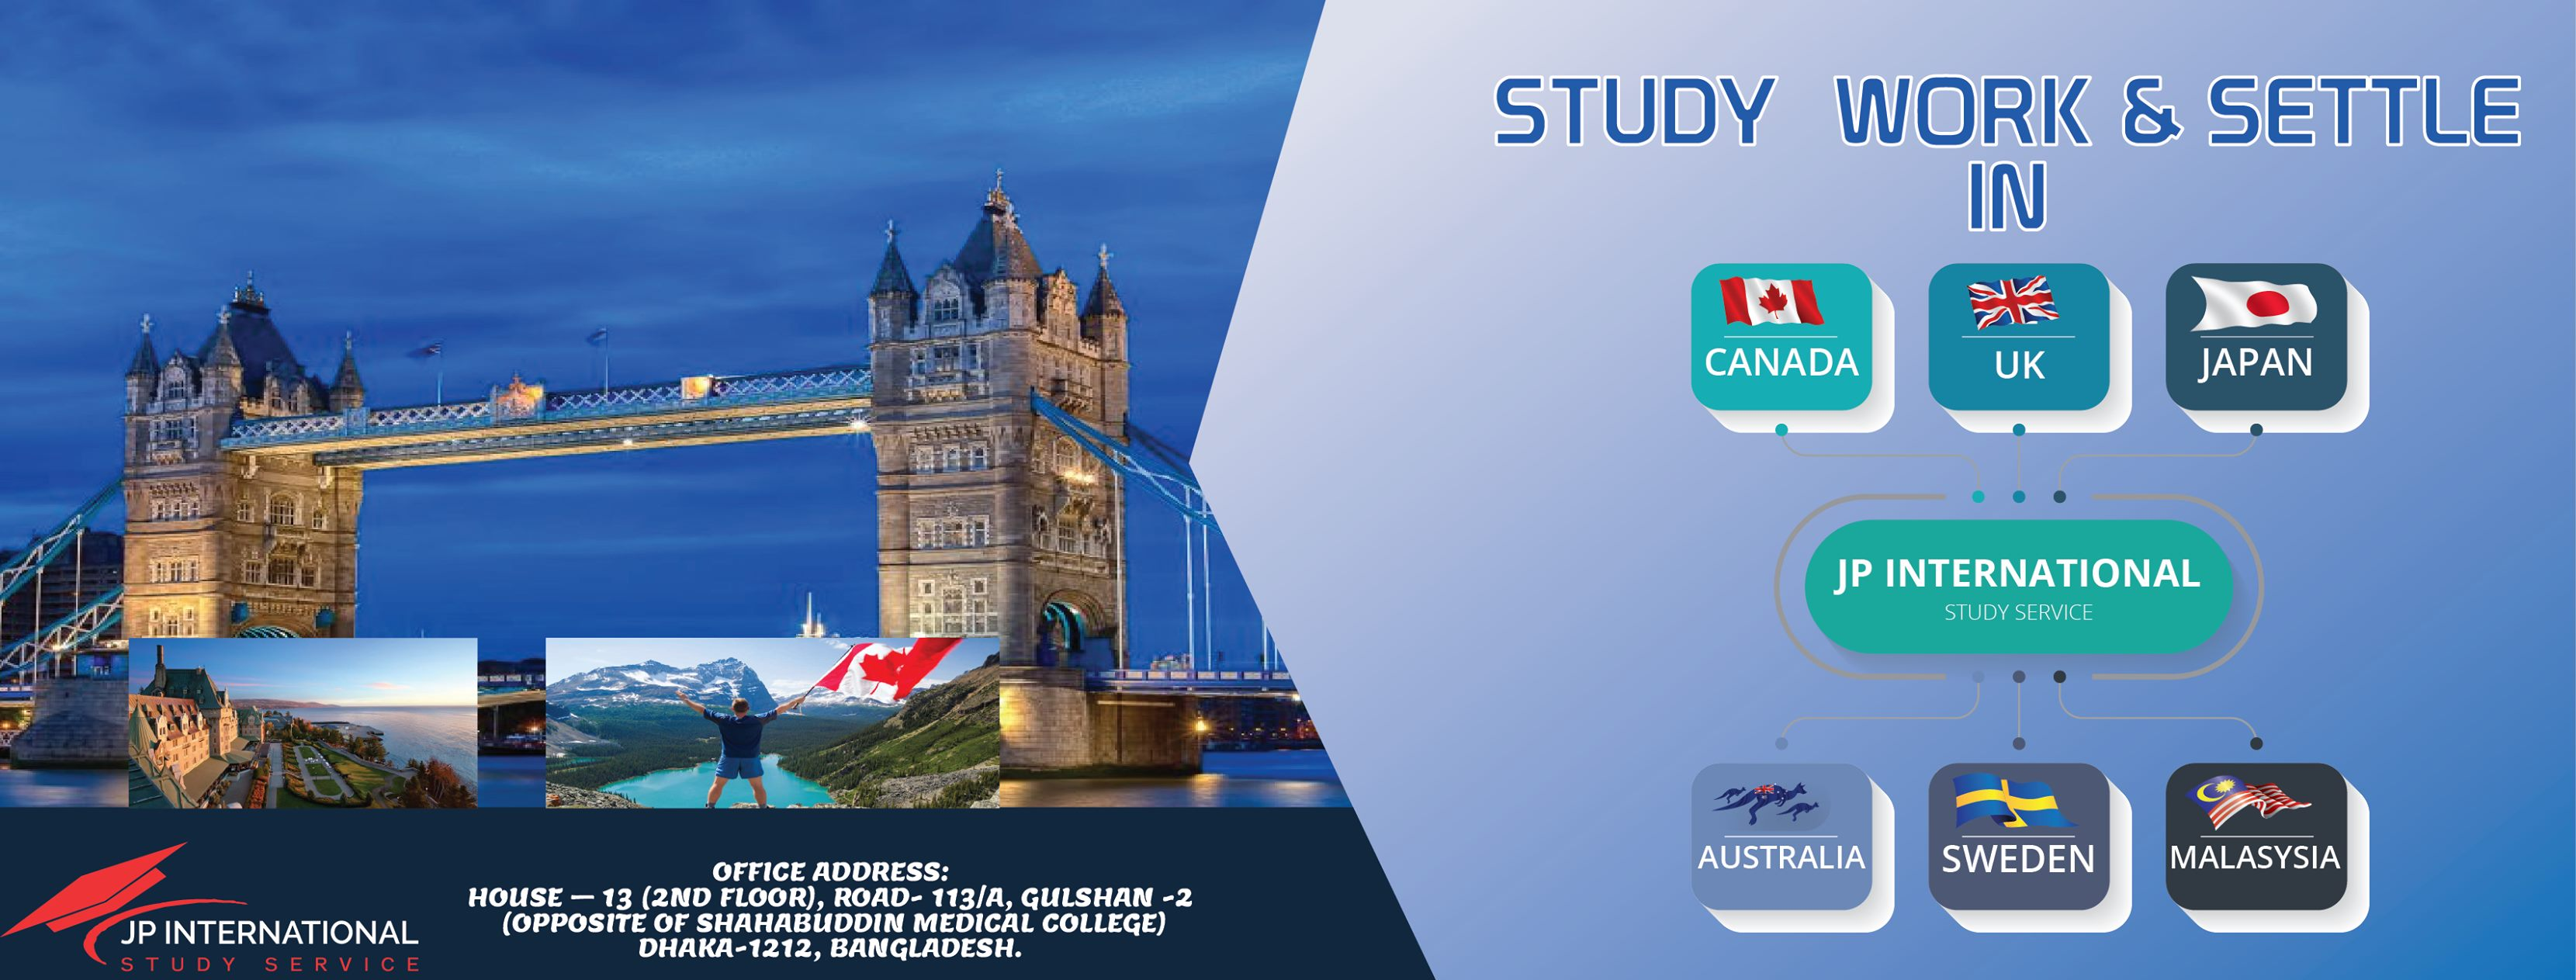 JP International Study Service